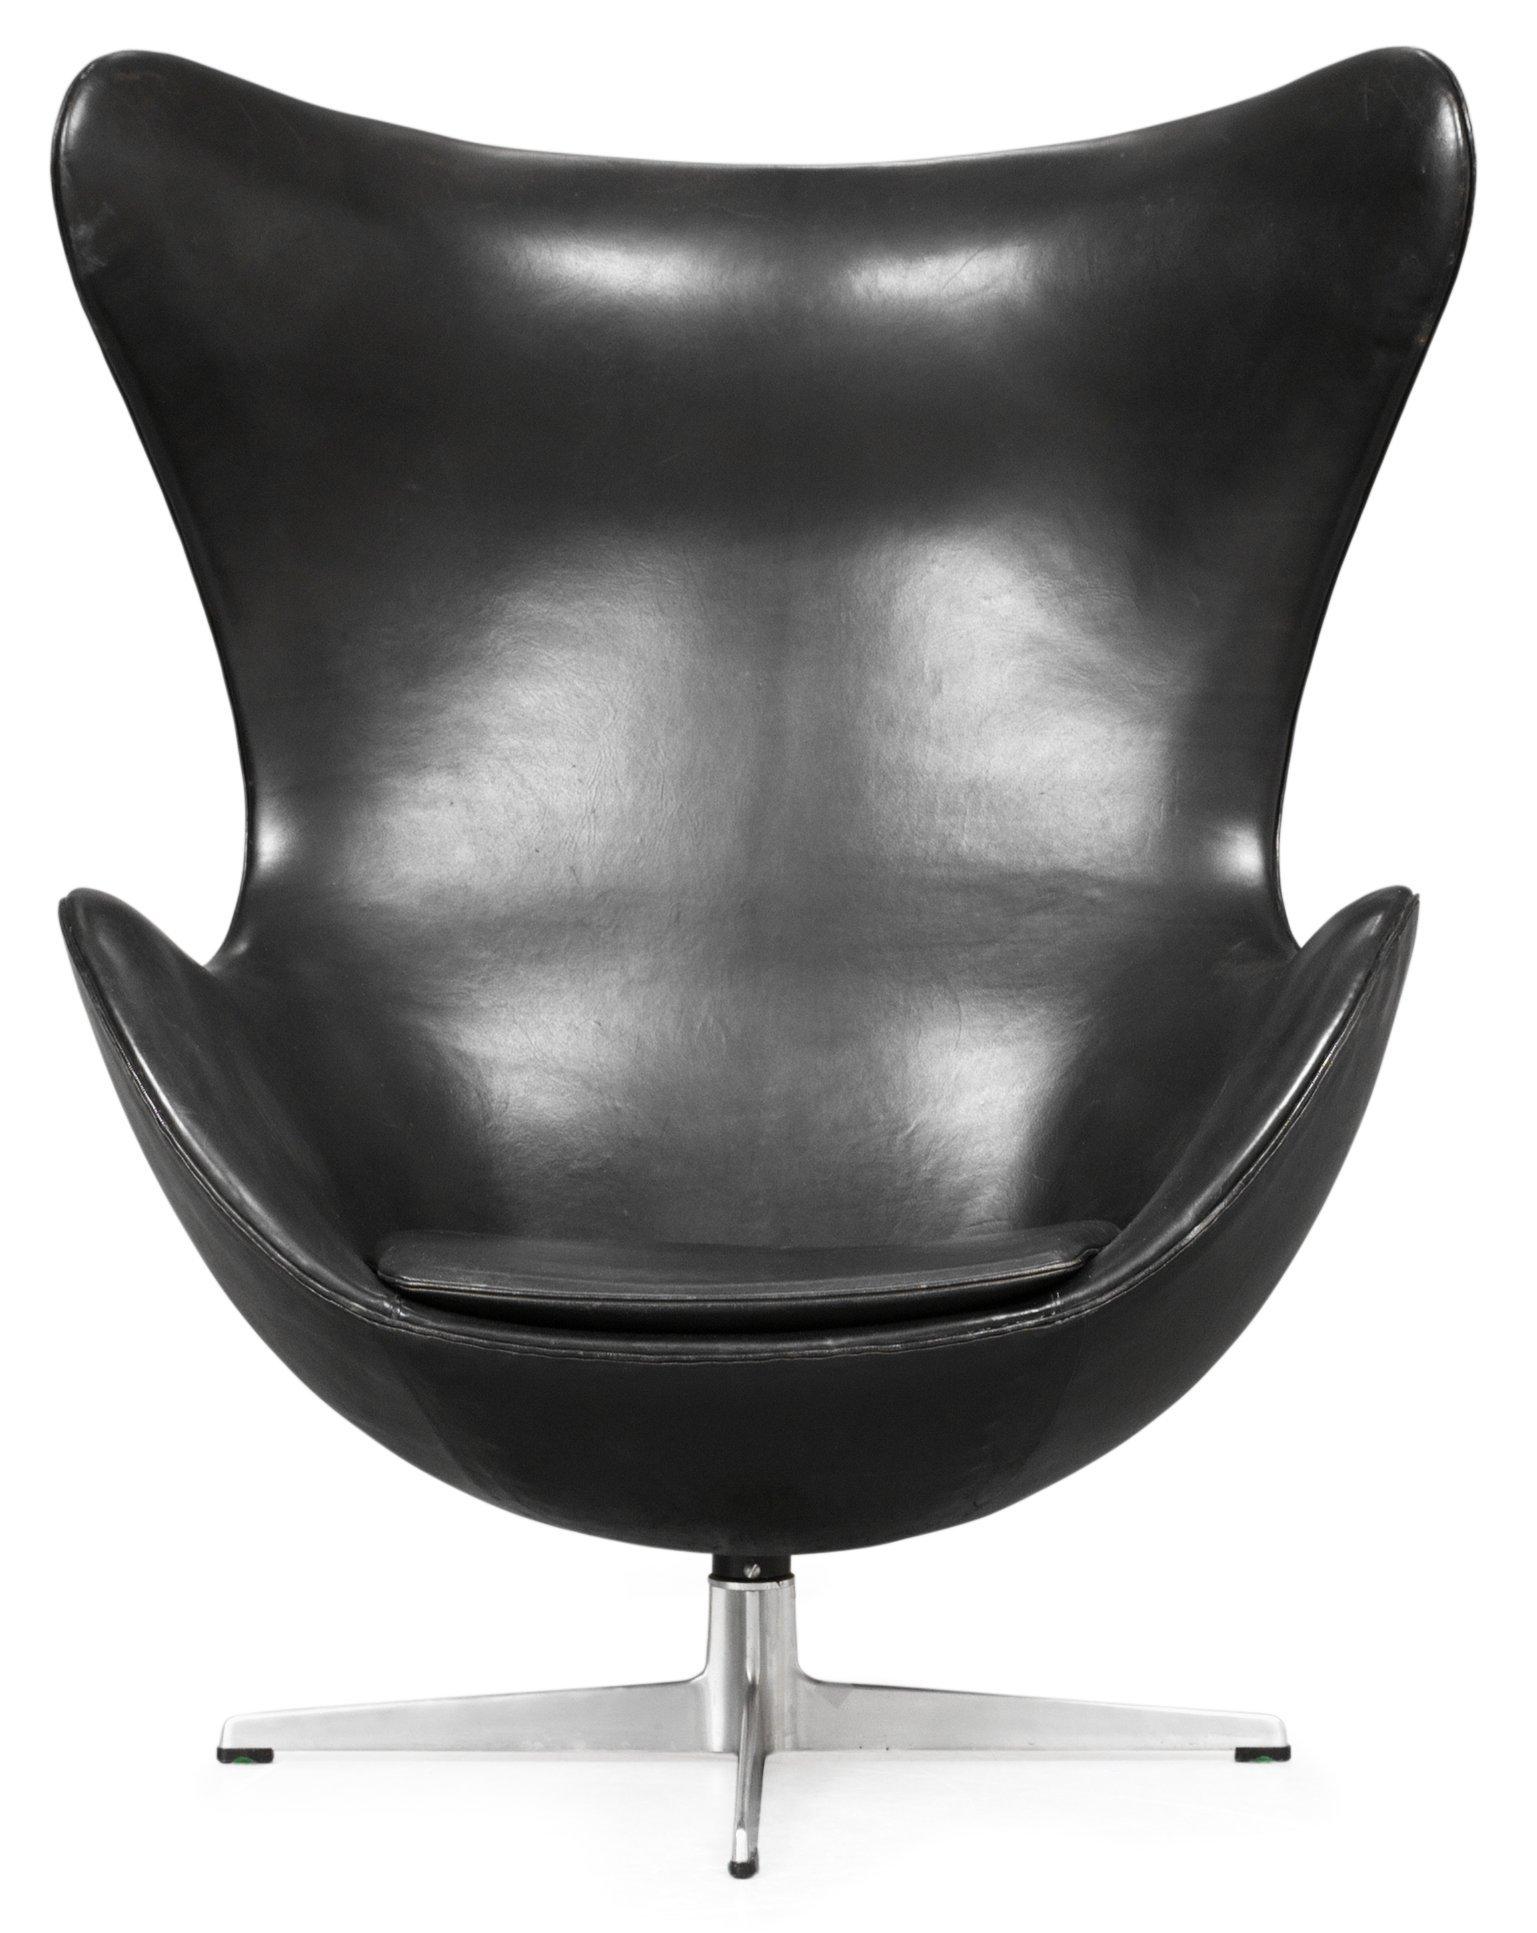 "ARNE JACOBSEN, fåtölj,""ägget Egg Chair"", Fritz Hansen, Danmark 1960 tal Bukowskis"